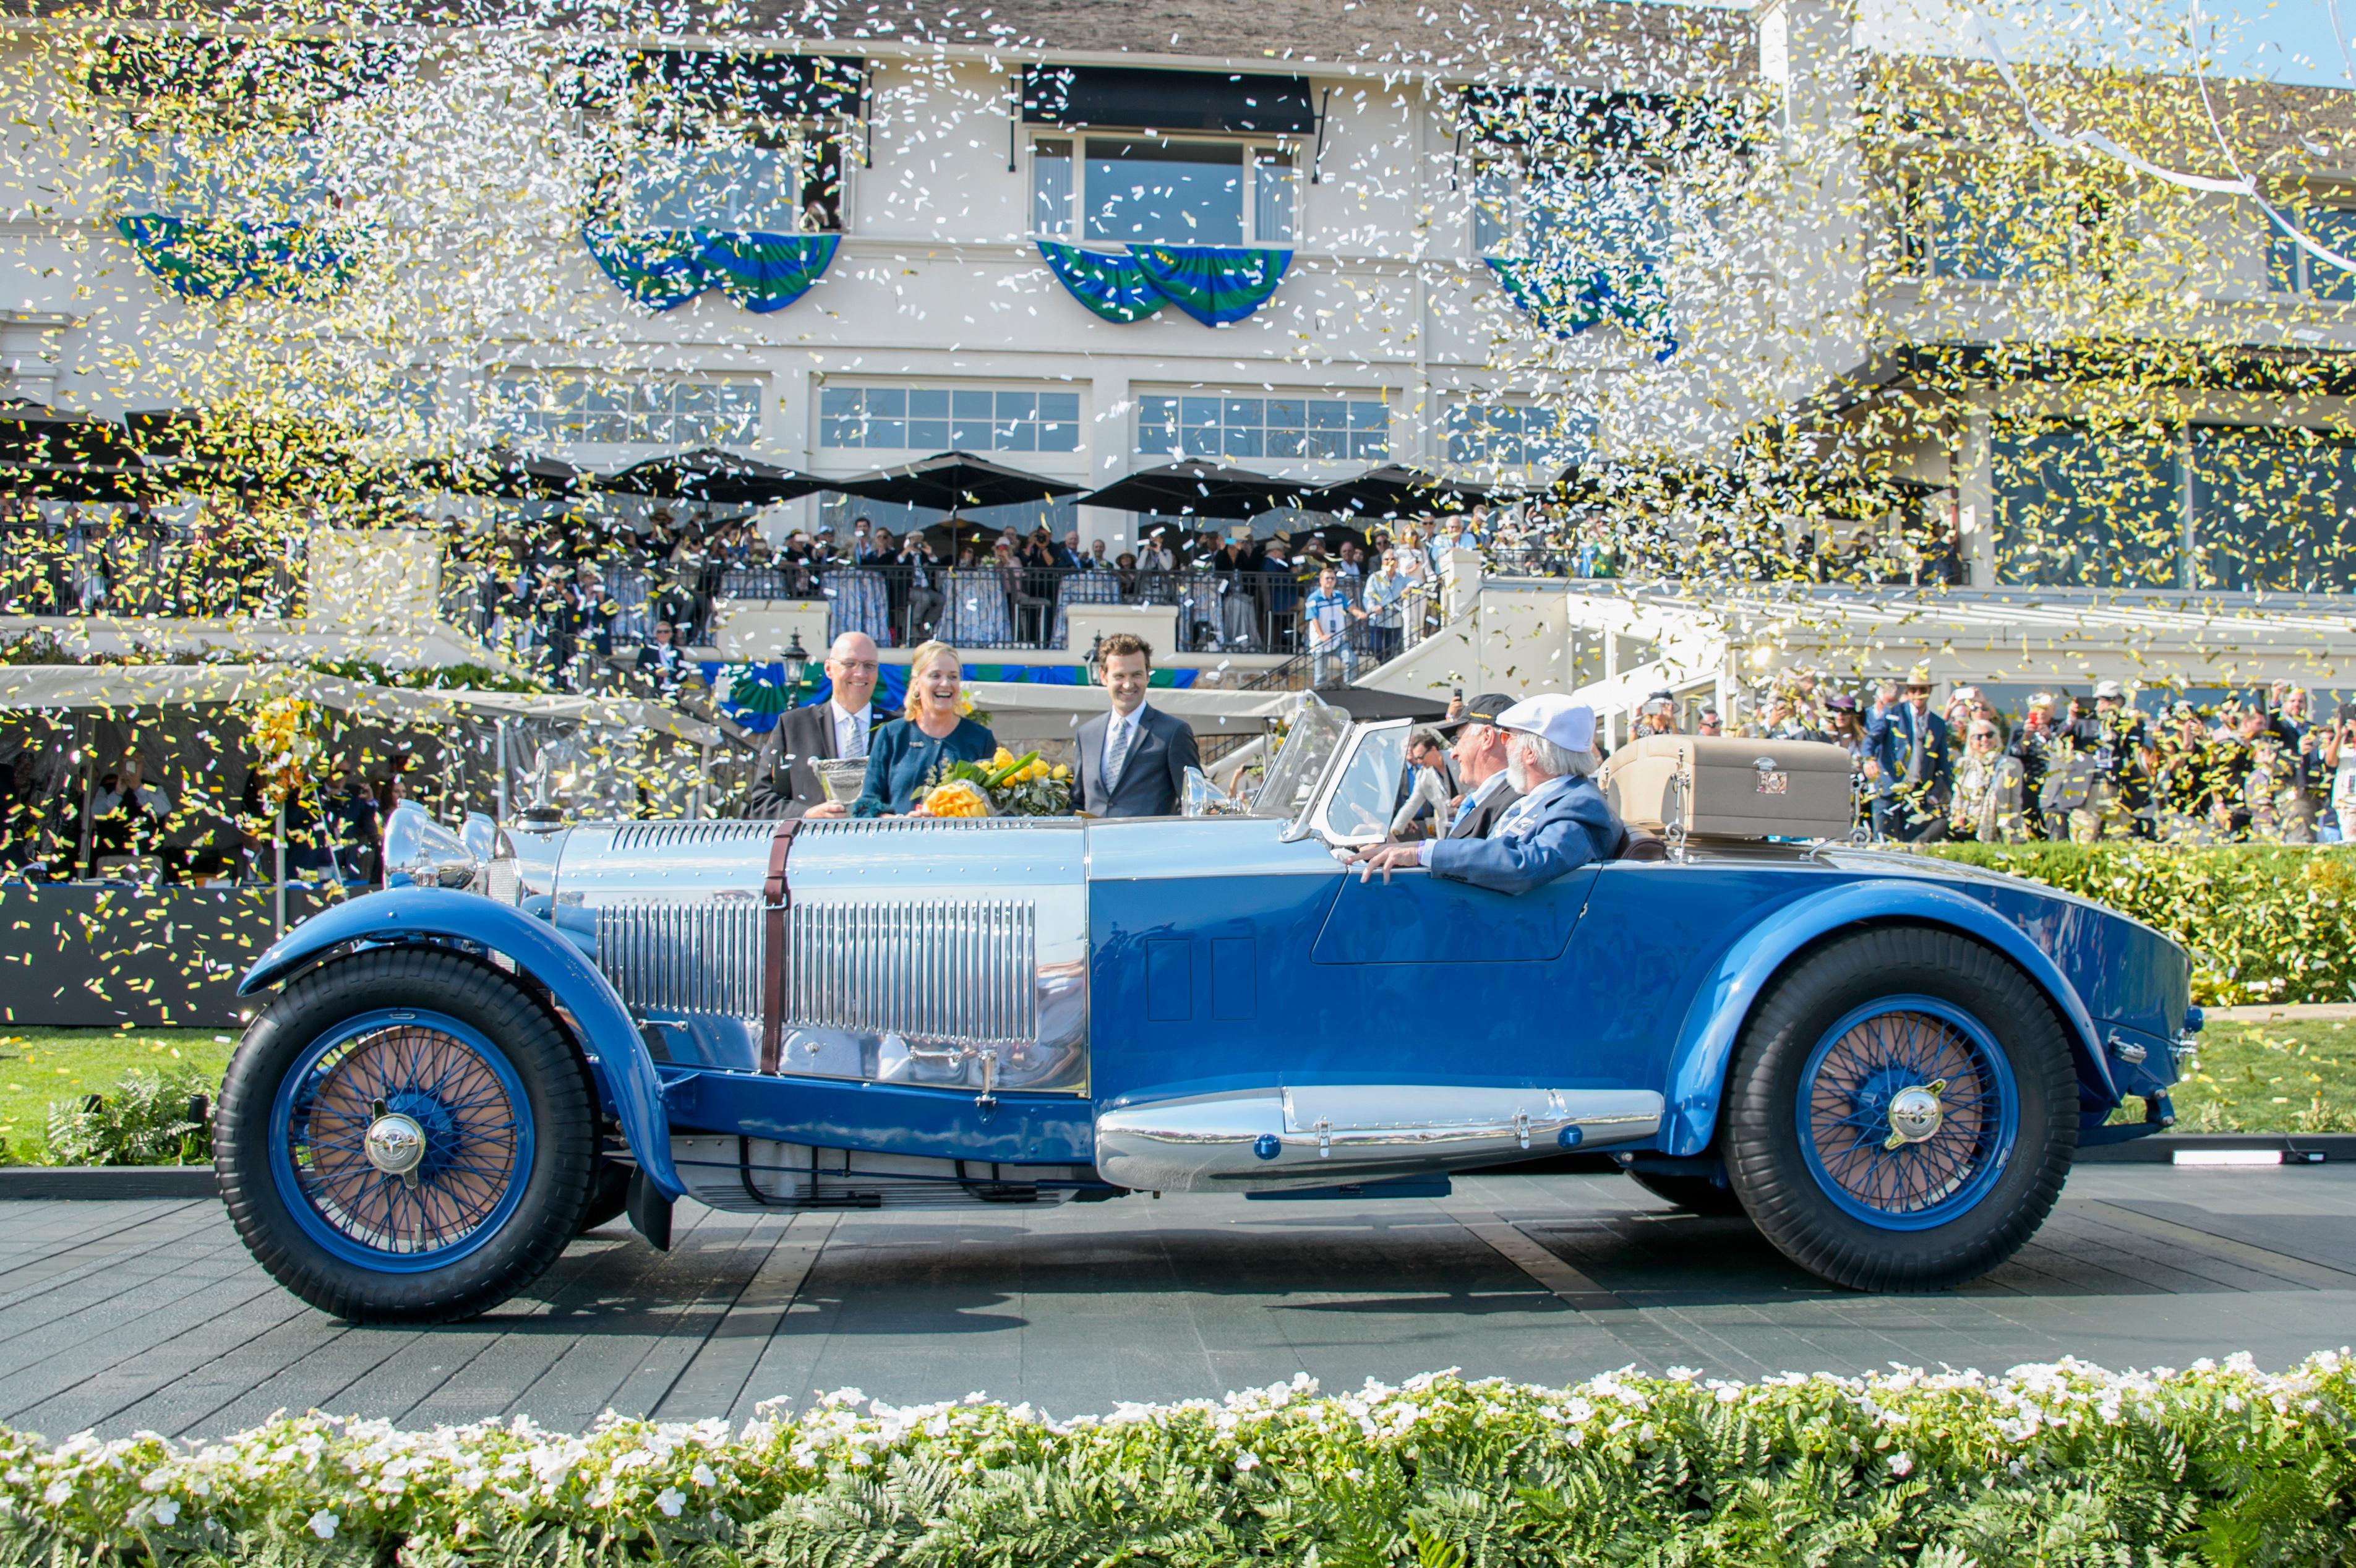 1929 Mercedes-Benz S Barker Tourer wins Gran Turismo Trophy at Pebble Beach Concours d'Elegance